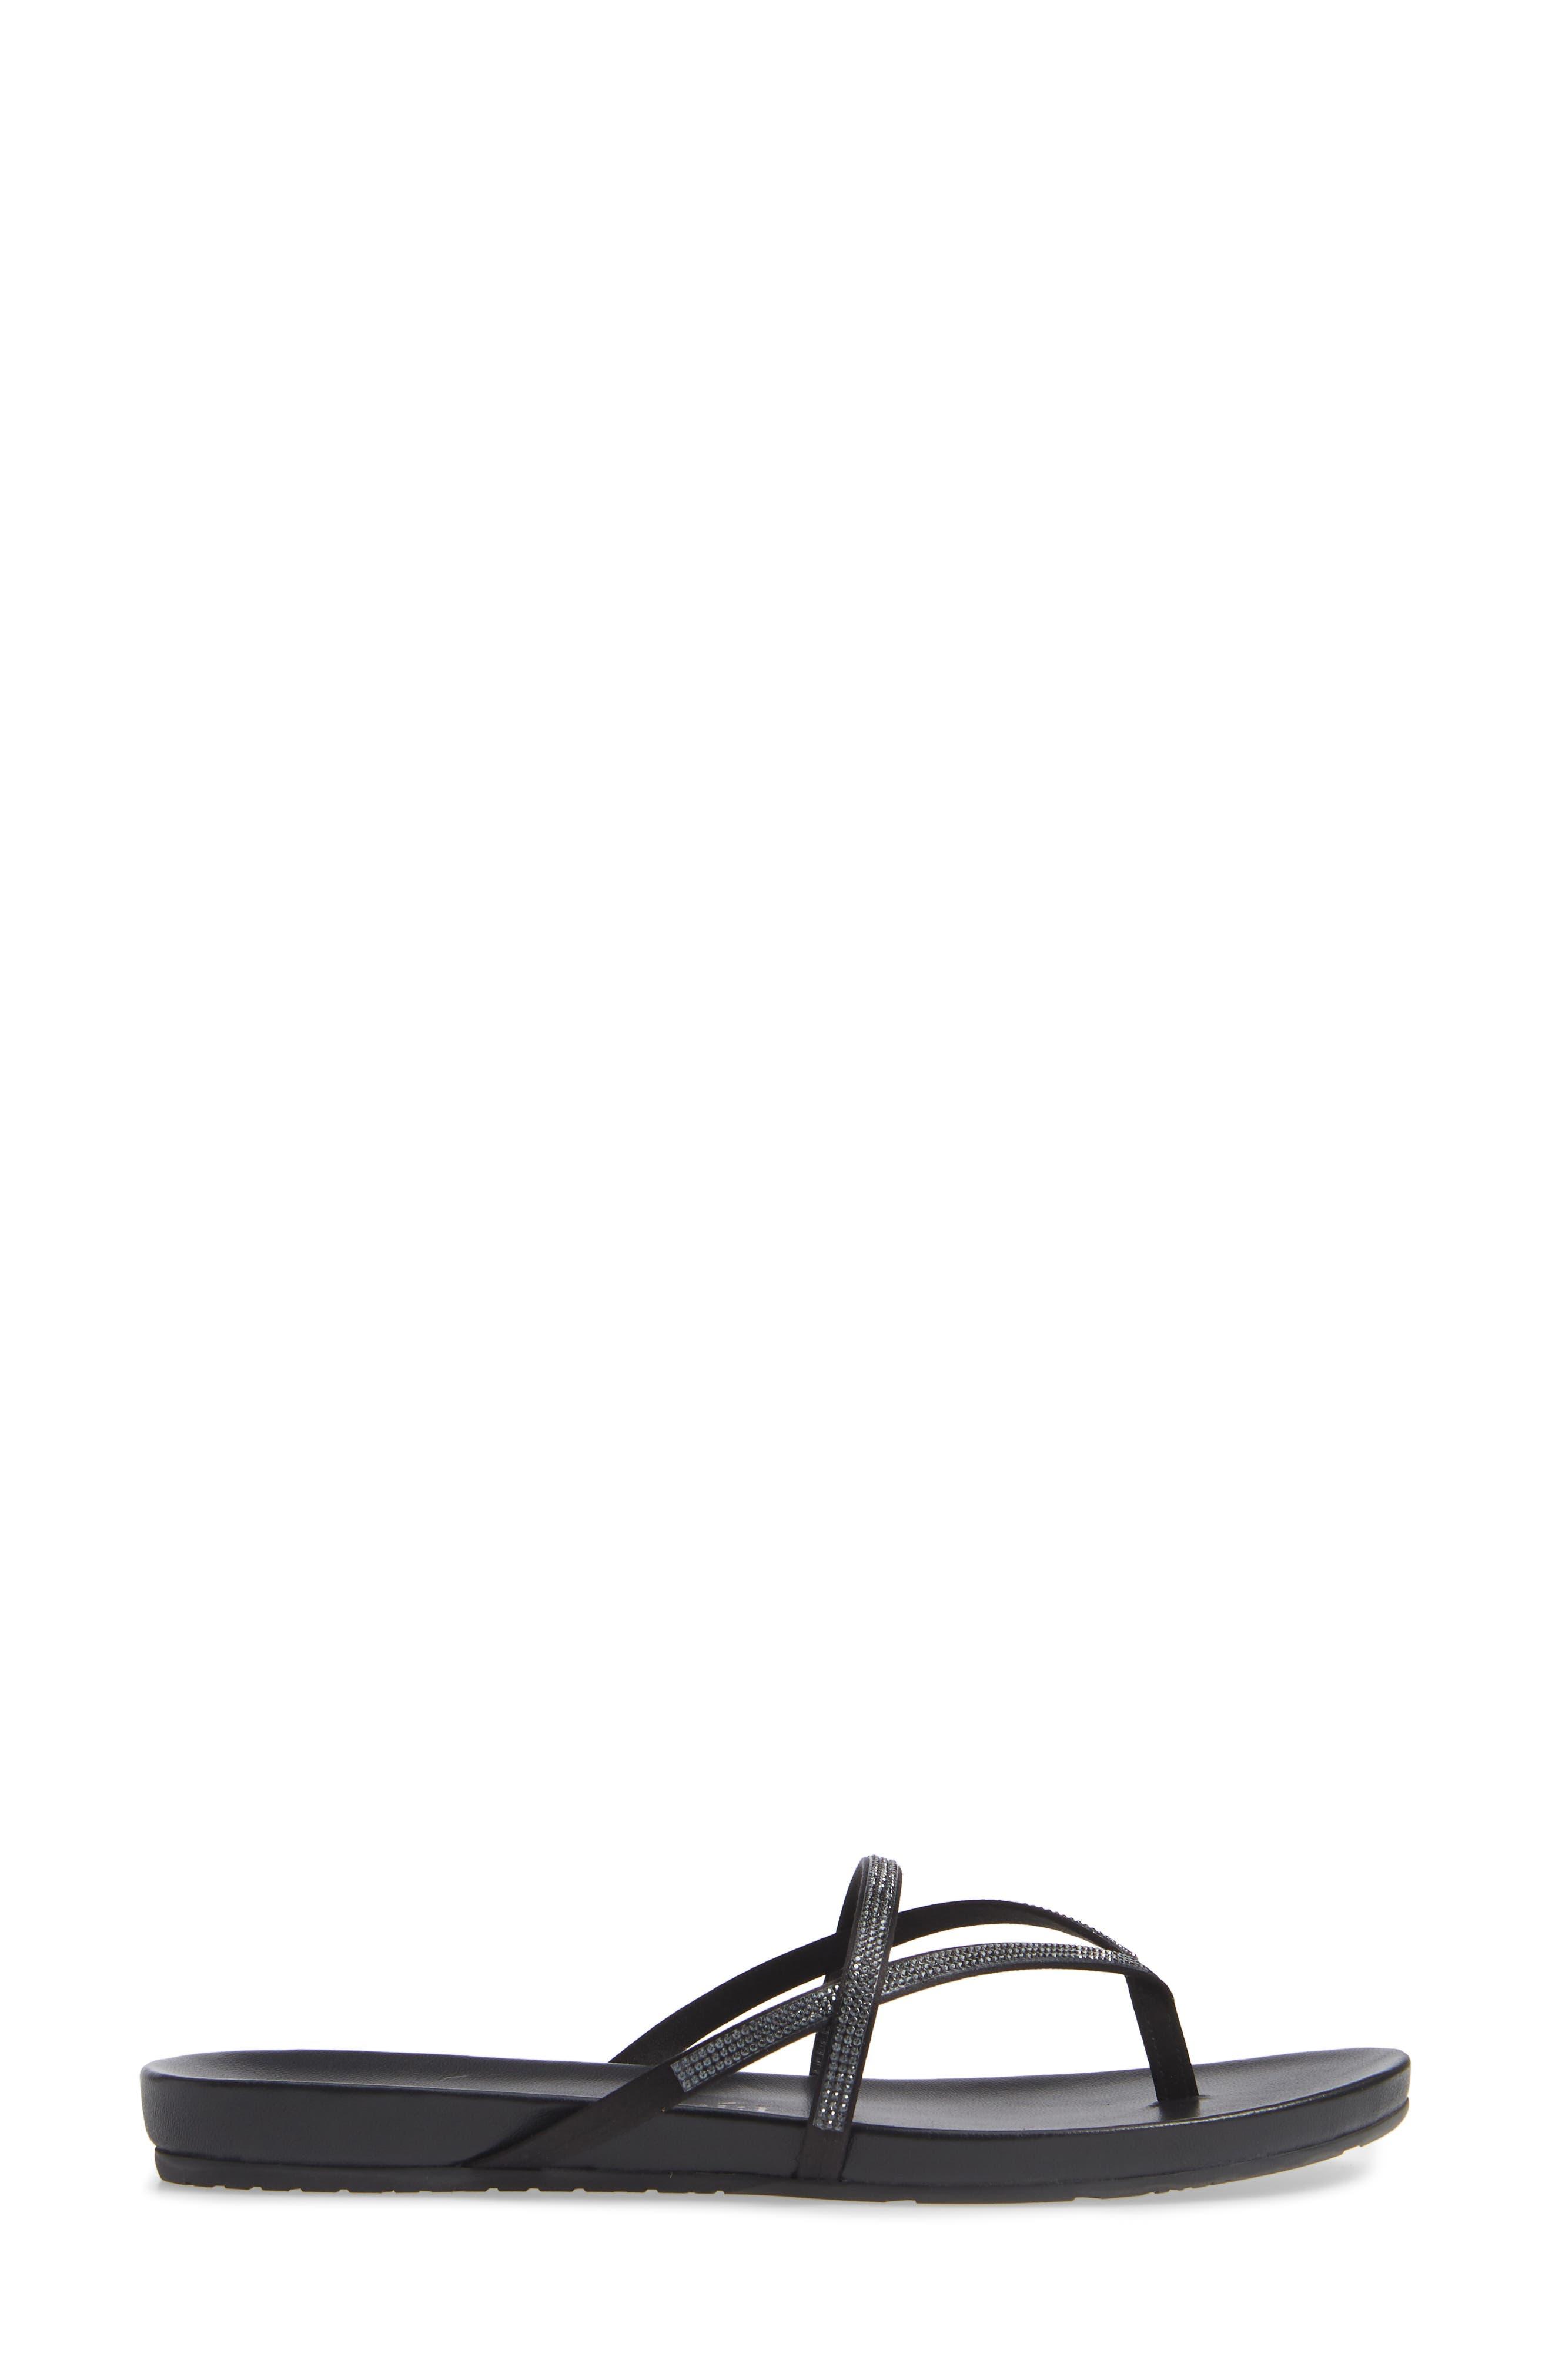 PEDRO GARCIA, Giulia Crystal Embellished Sandal, Alternate thumbnail 3, color, METEORITE SATIN